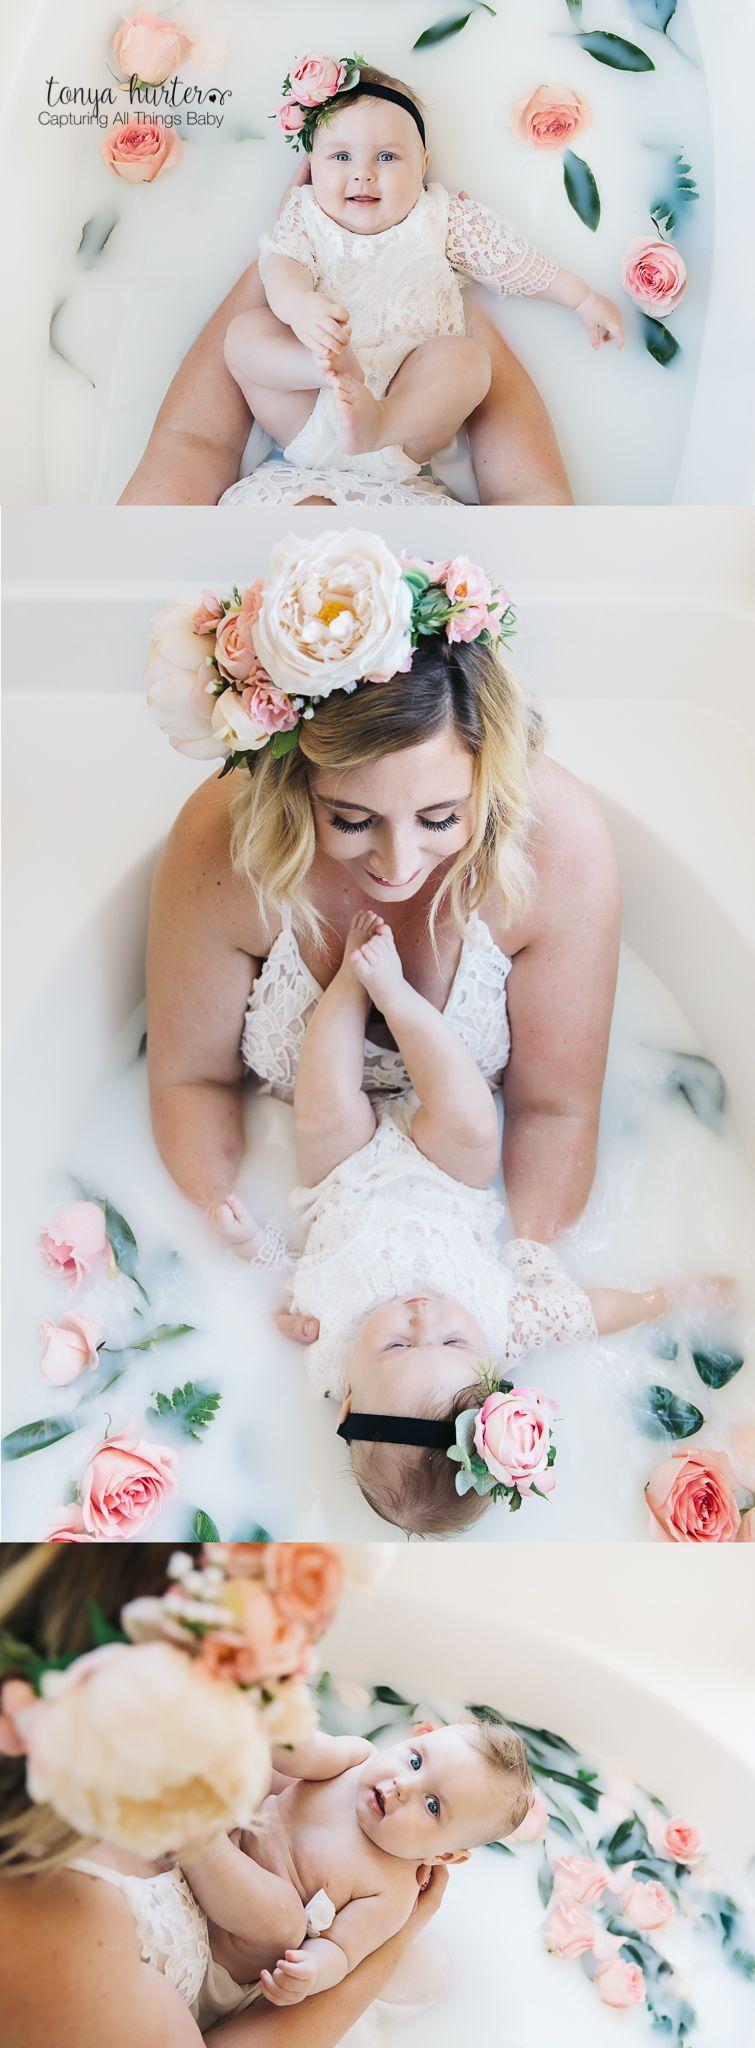 Mother and Baby Milk Bath Photo Shoot, Raleigh NC #milkbath